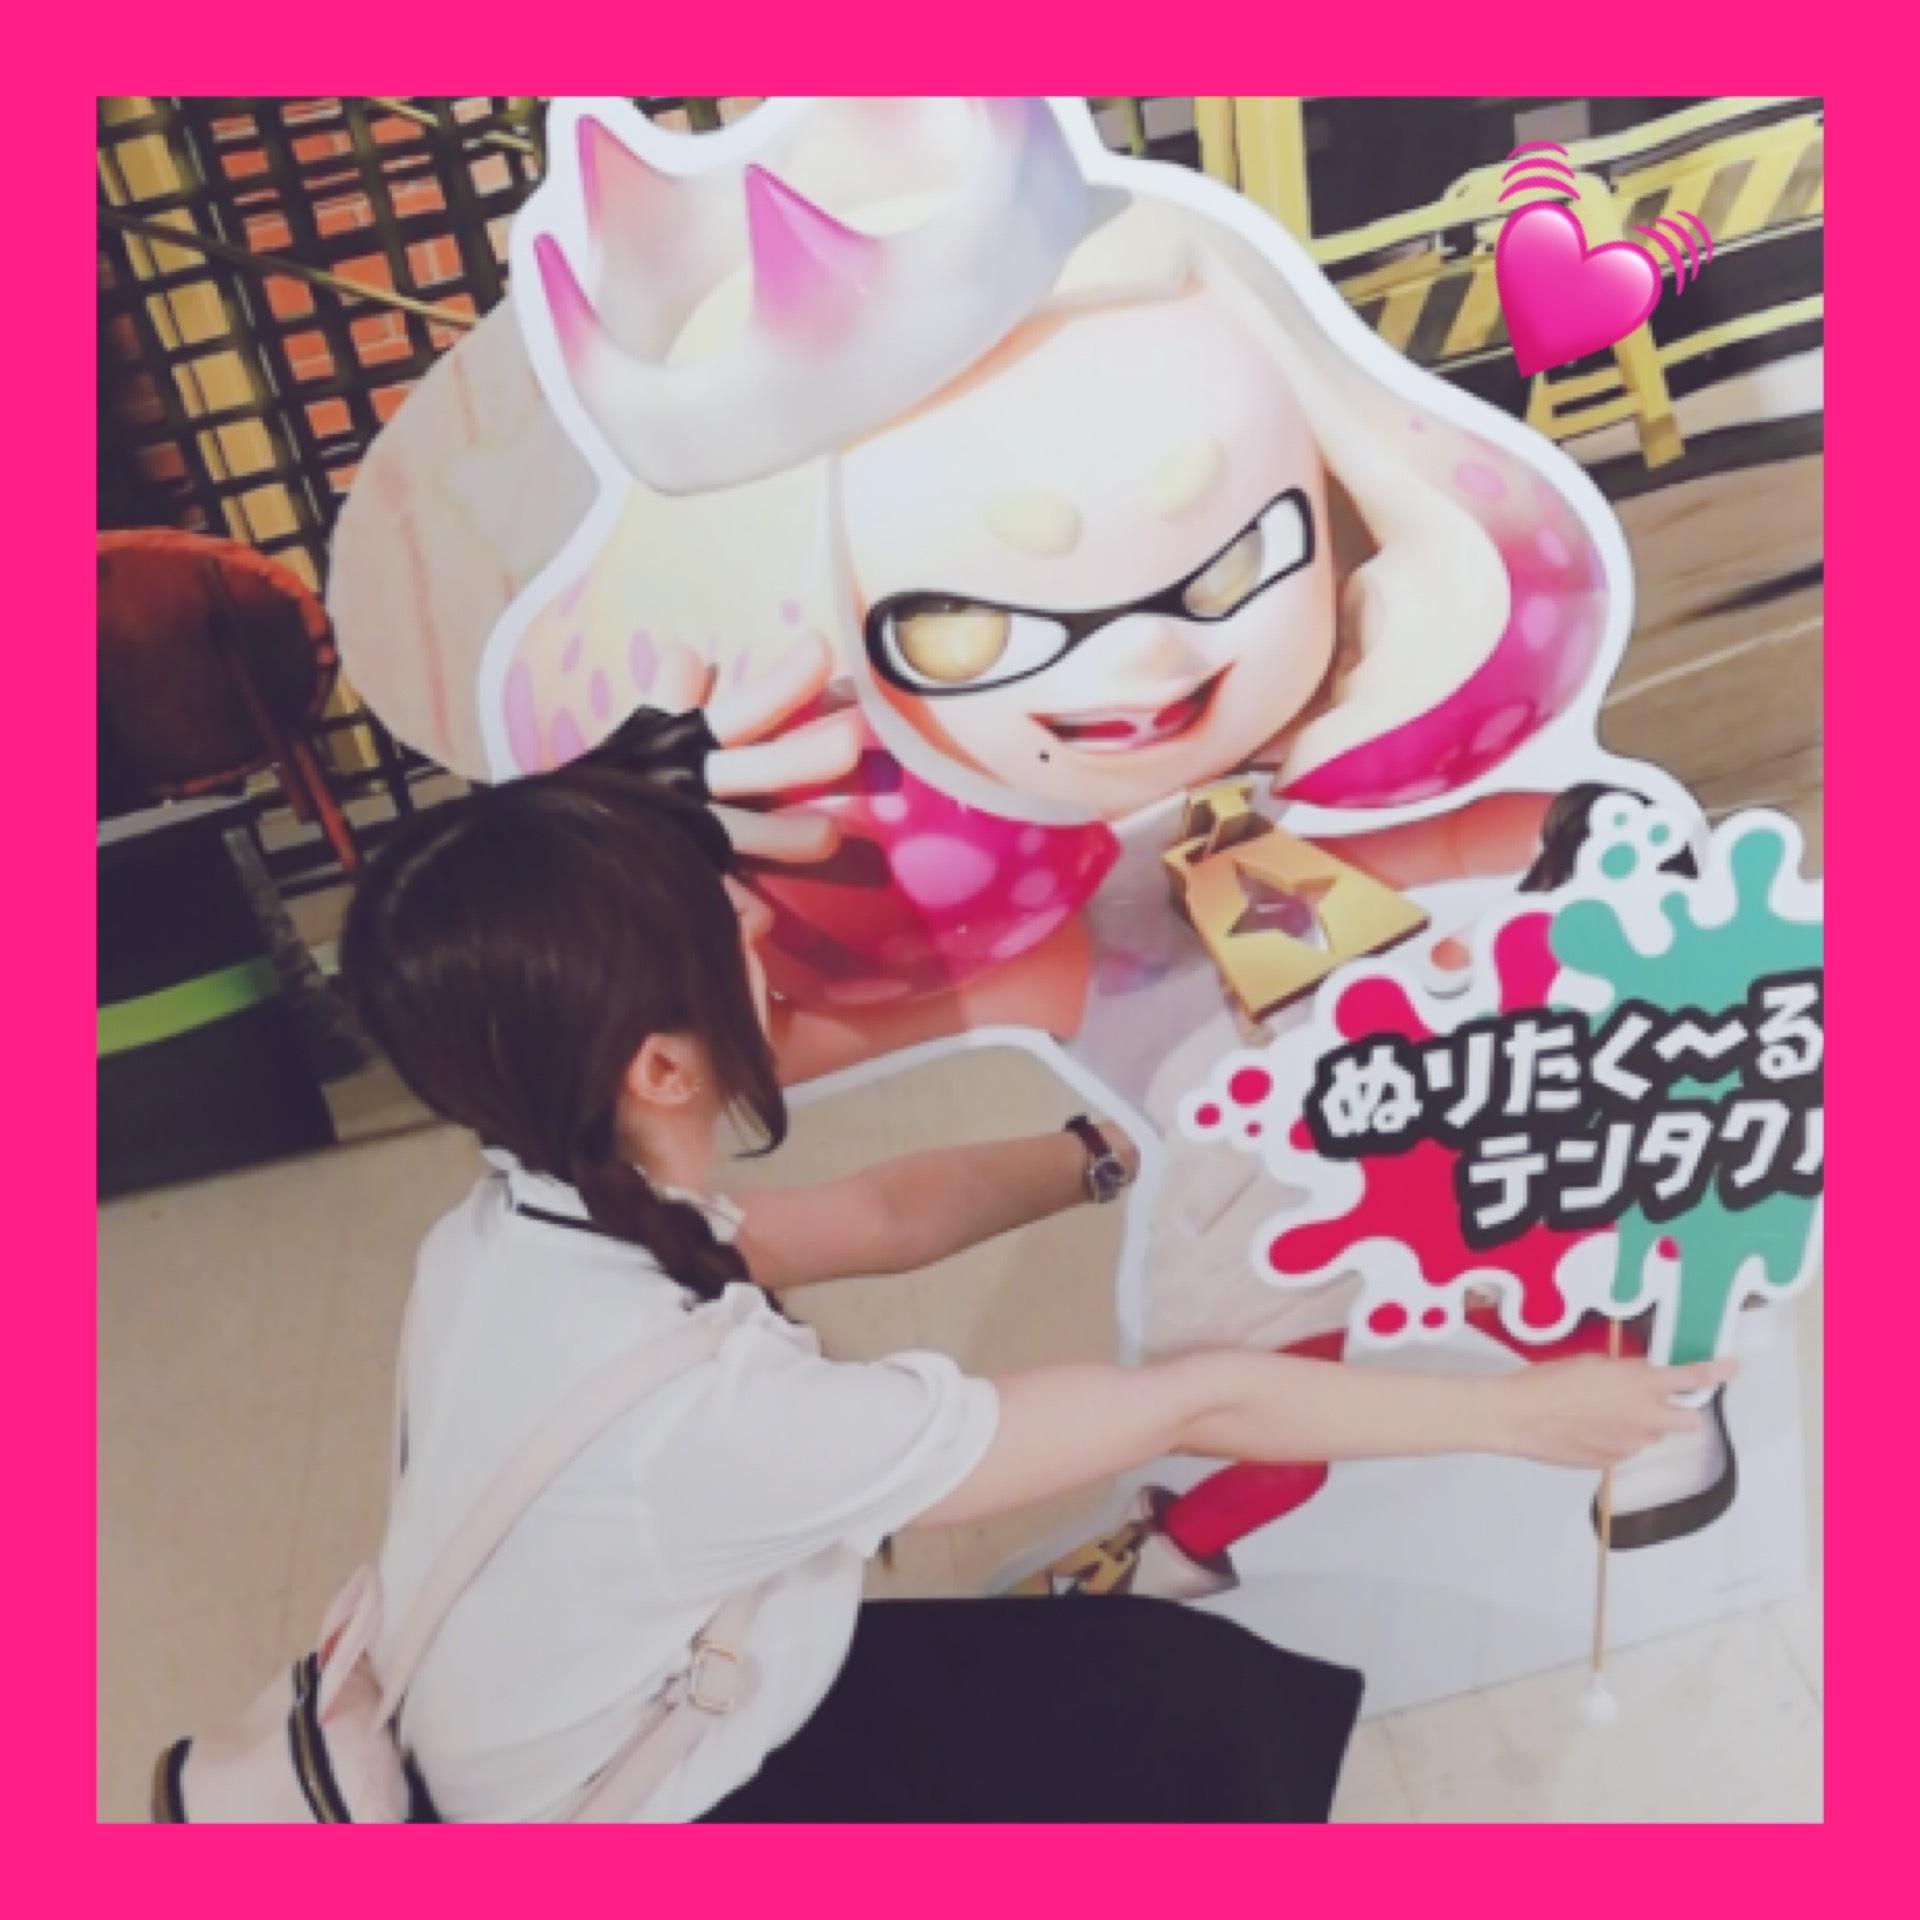 【Splatoon展】Shibuyaタワレコに行ってきました♡_1_4-1